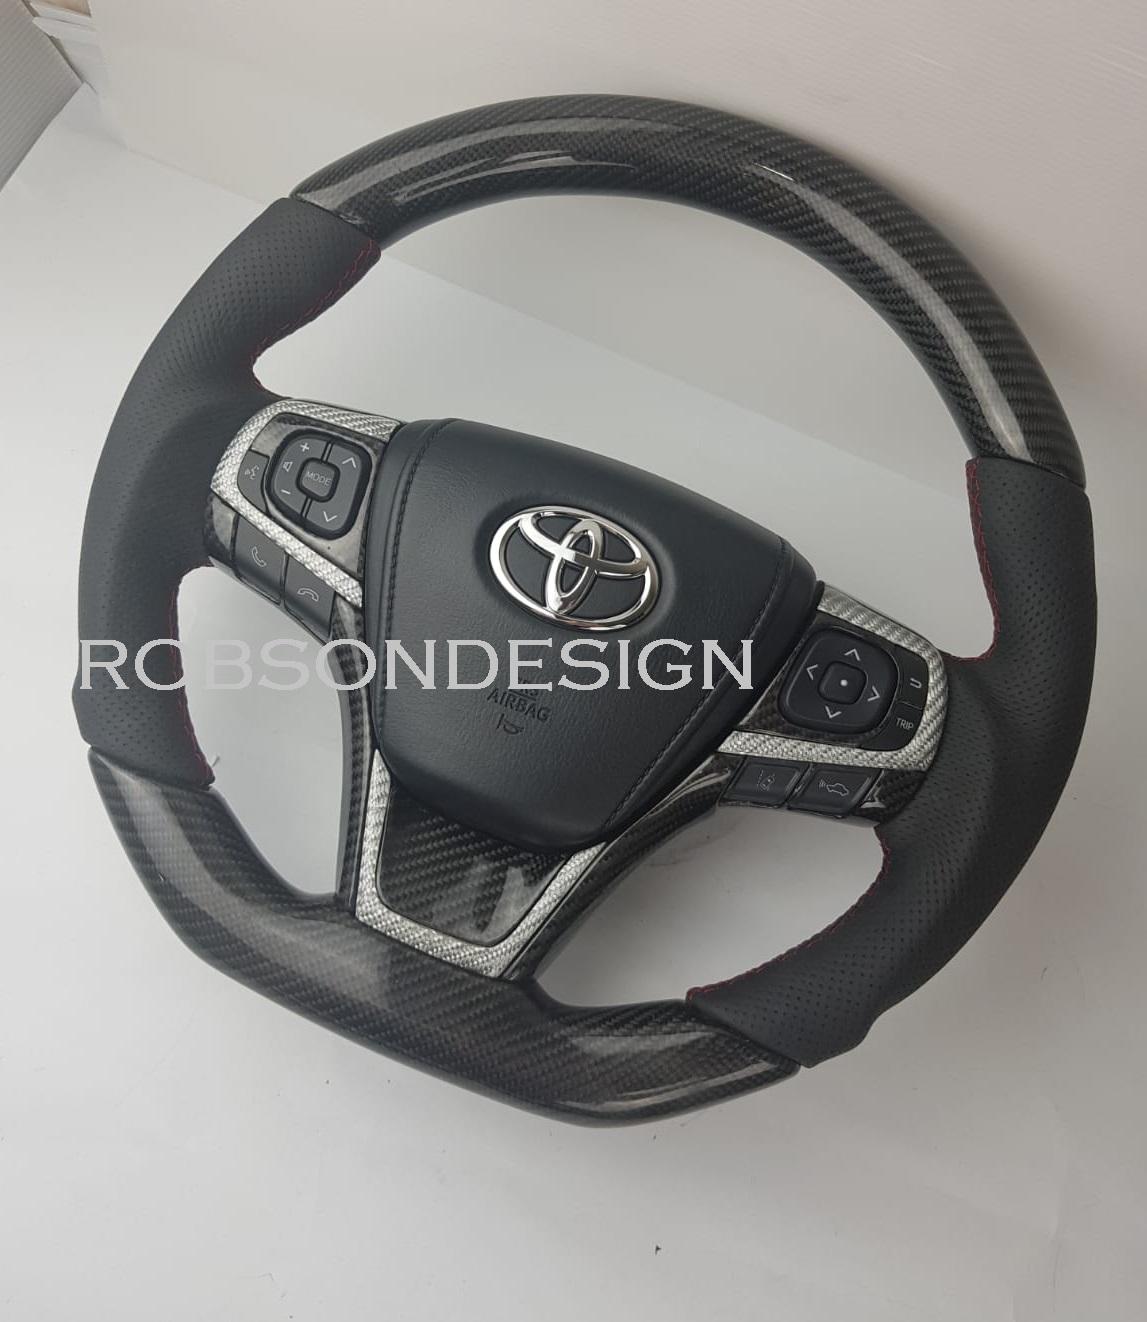 hight resolution of toyota camry harrier carbon fiber steering wheel 2015 2016 2017